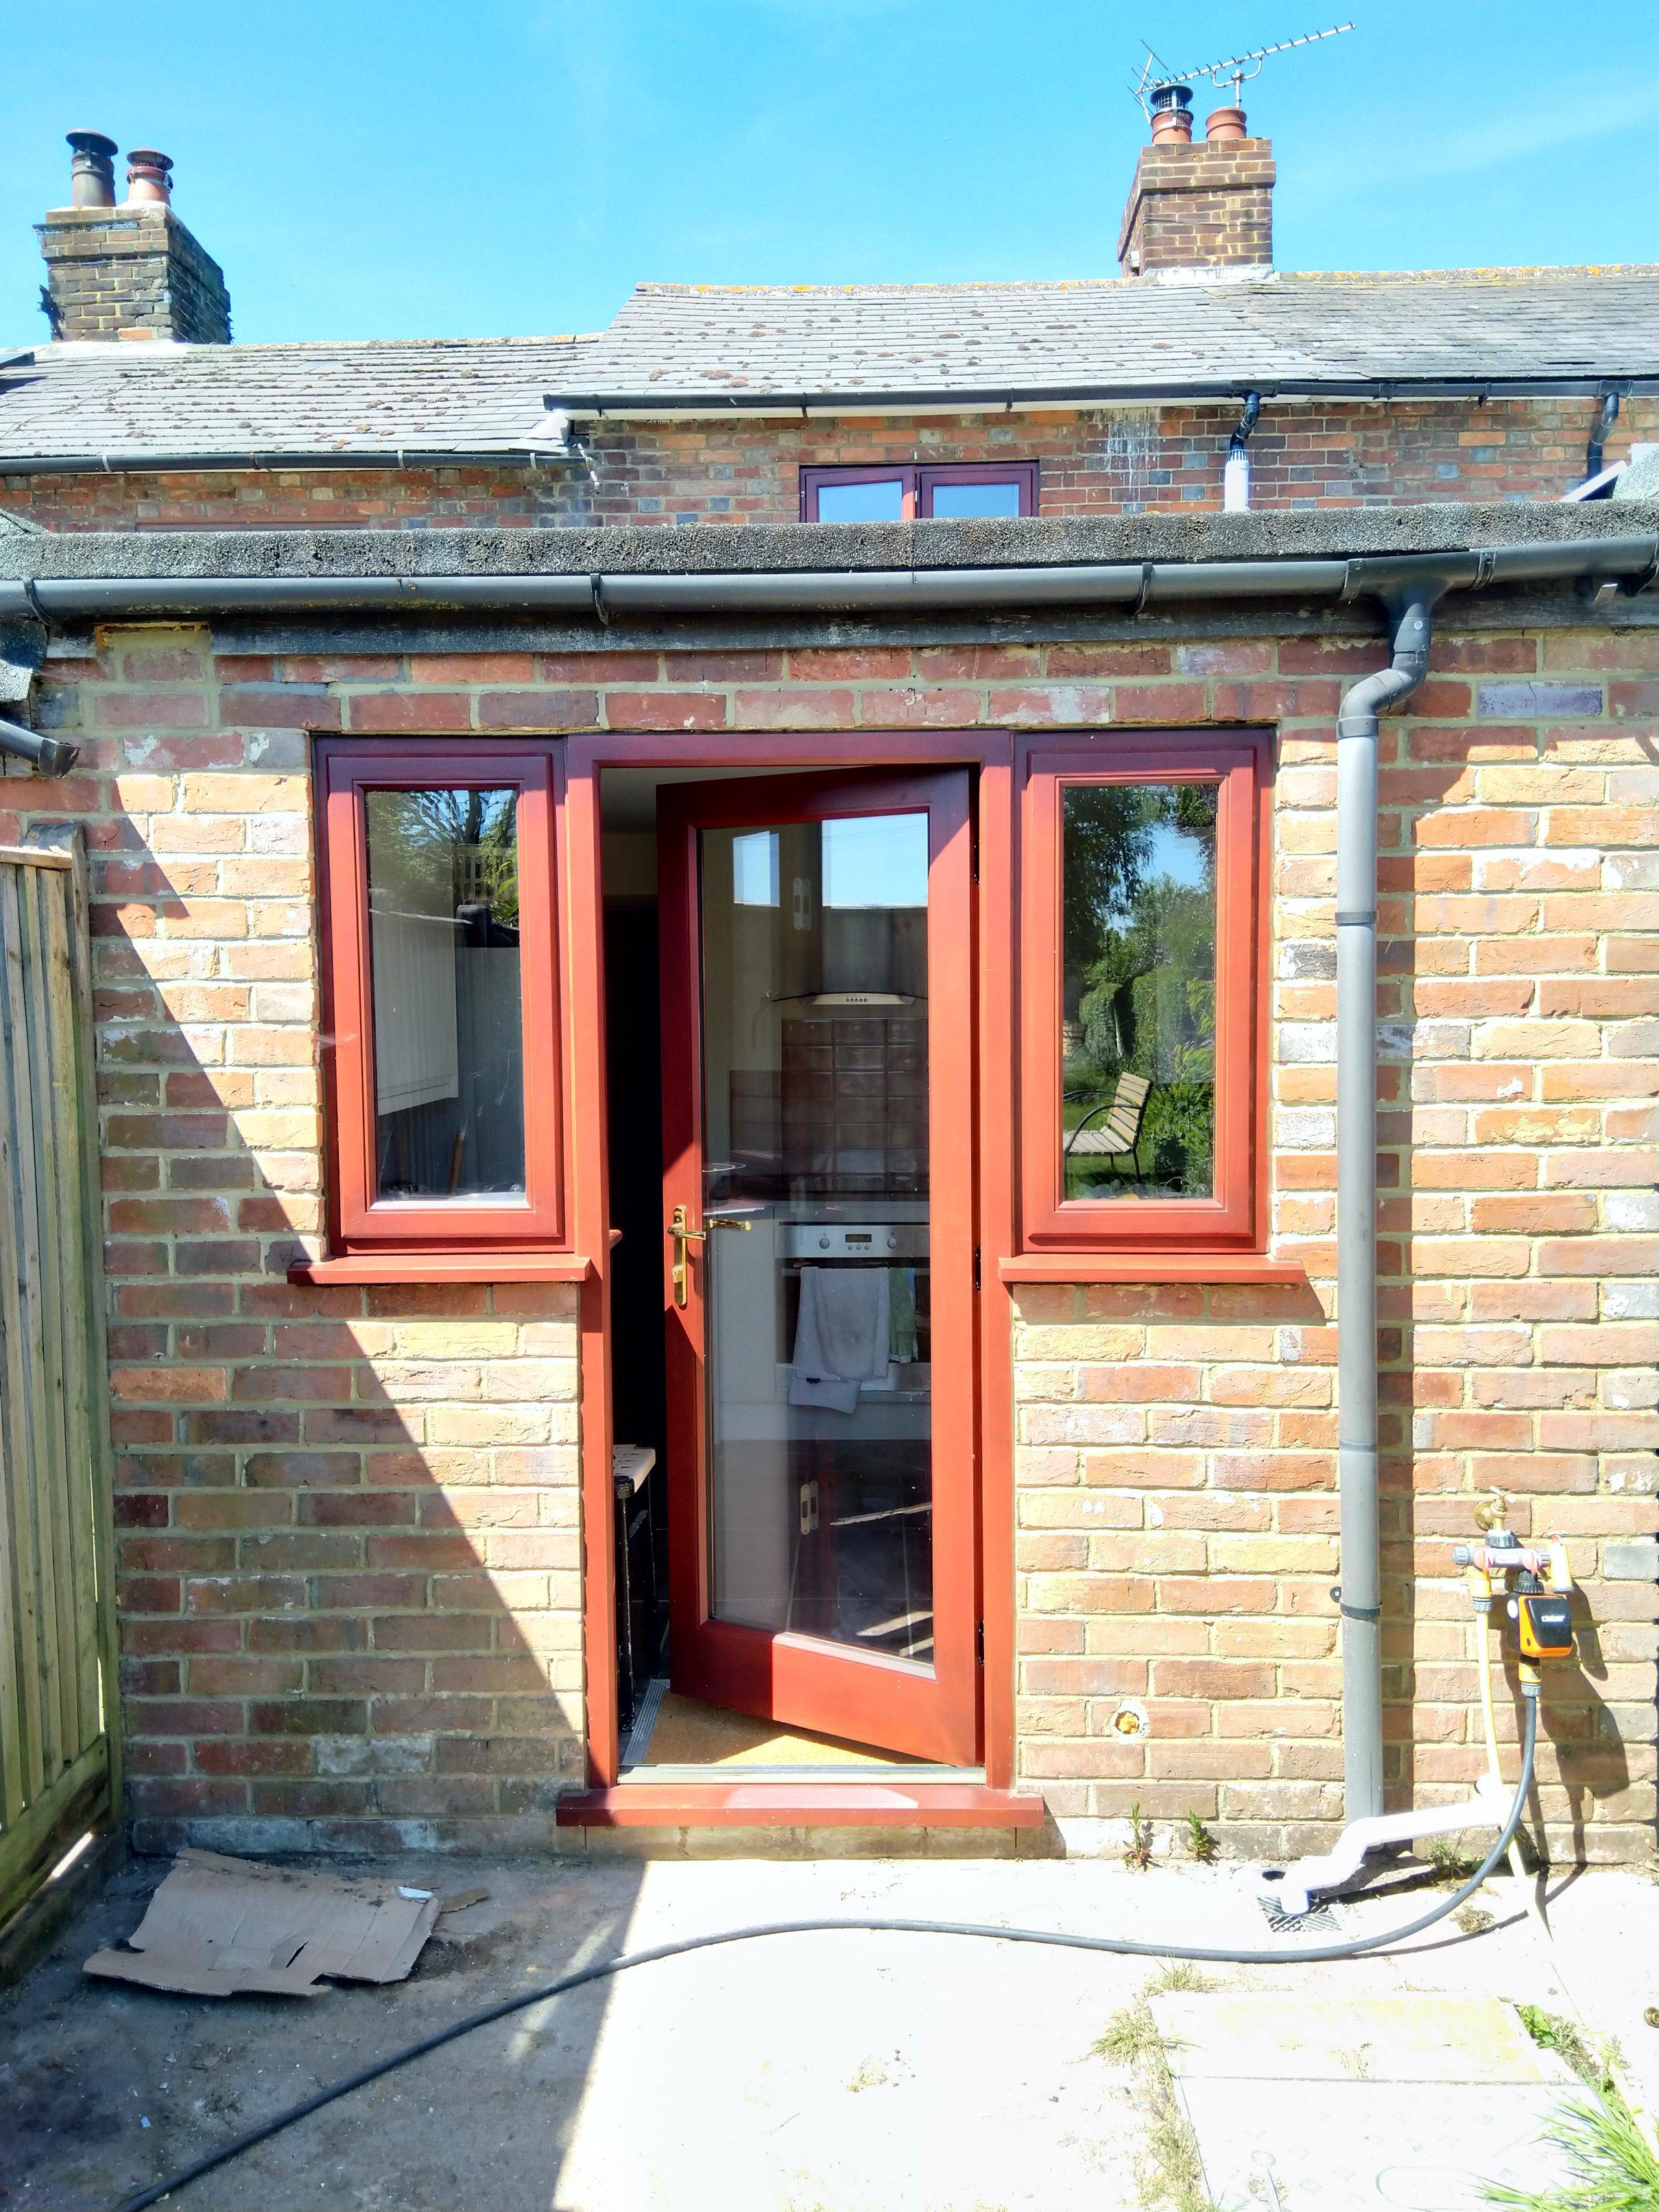 accoya-windows-east-peckham-tonbridge-2